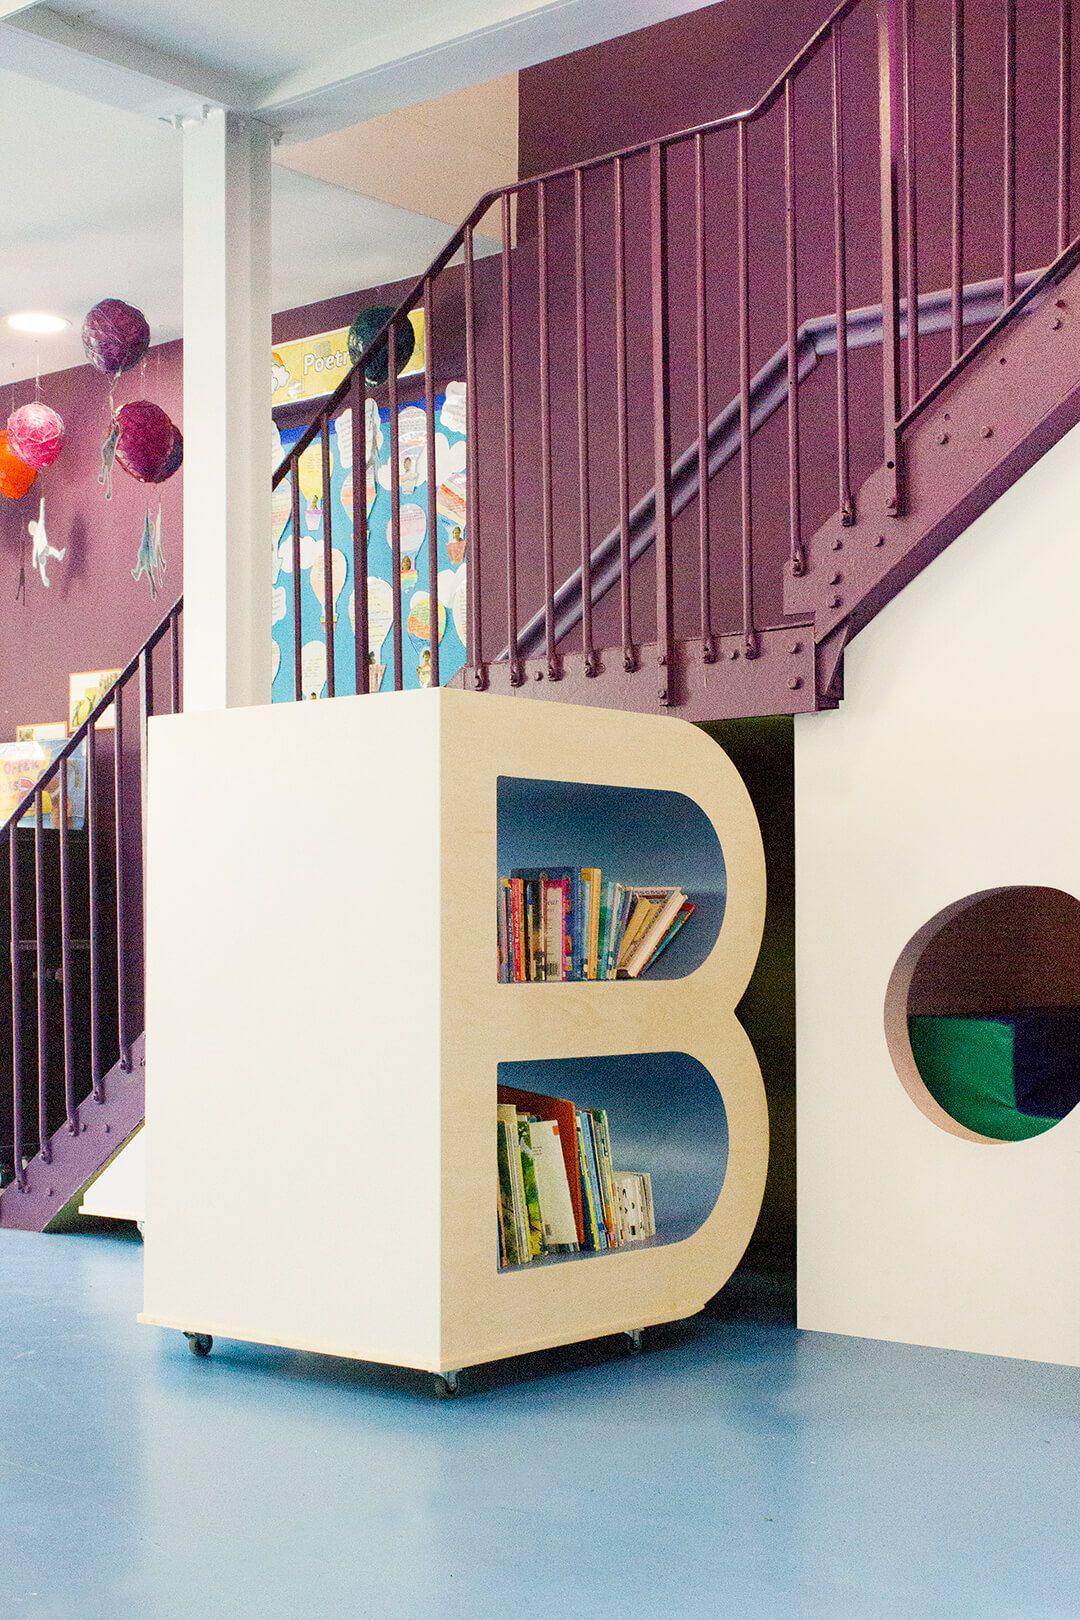 Aberrant Adds Colour And Flexibility To A British School School Interior Kindergarten Design School Design